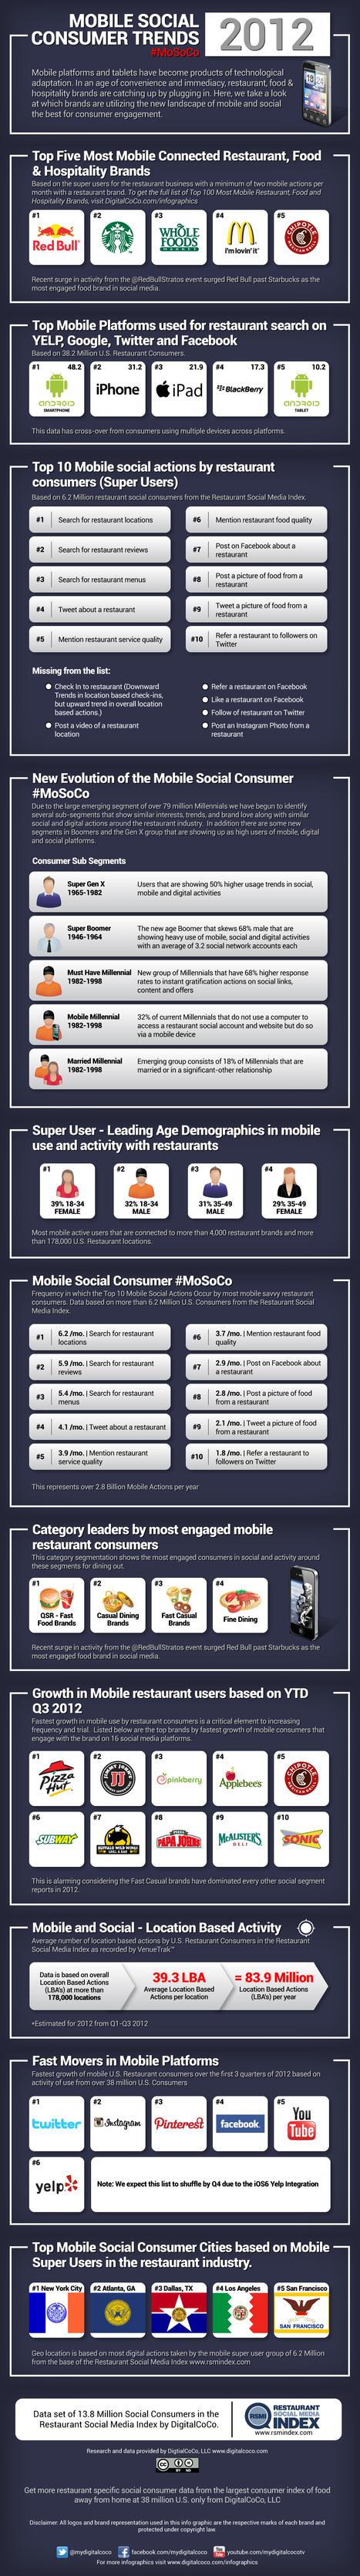 DigitalCoco digital brand development, social marketing & creative content - 2012 Mobile Social Consumer Infographic | Marketing & Webmarketing | Scoop.it